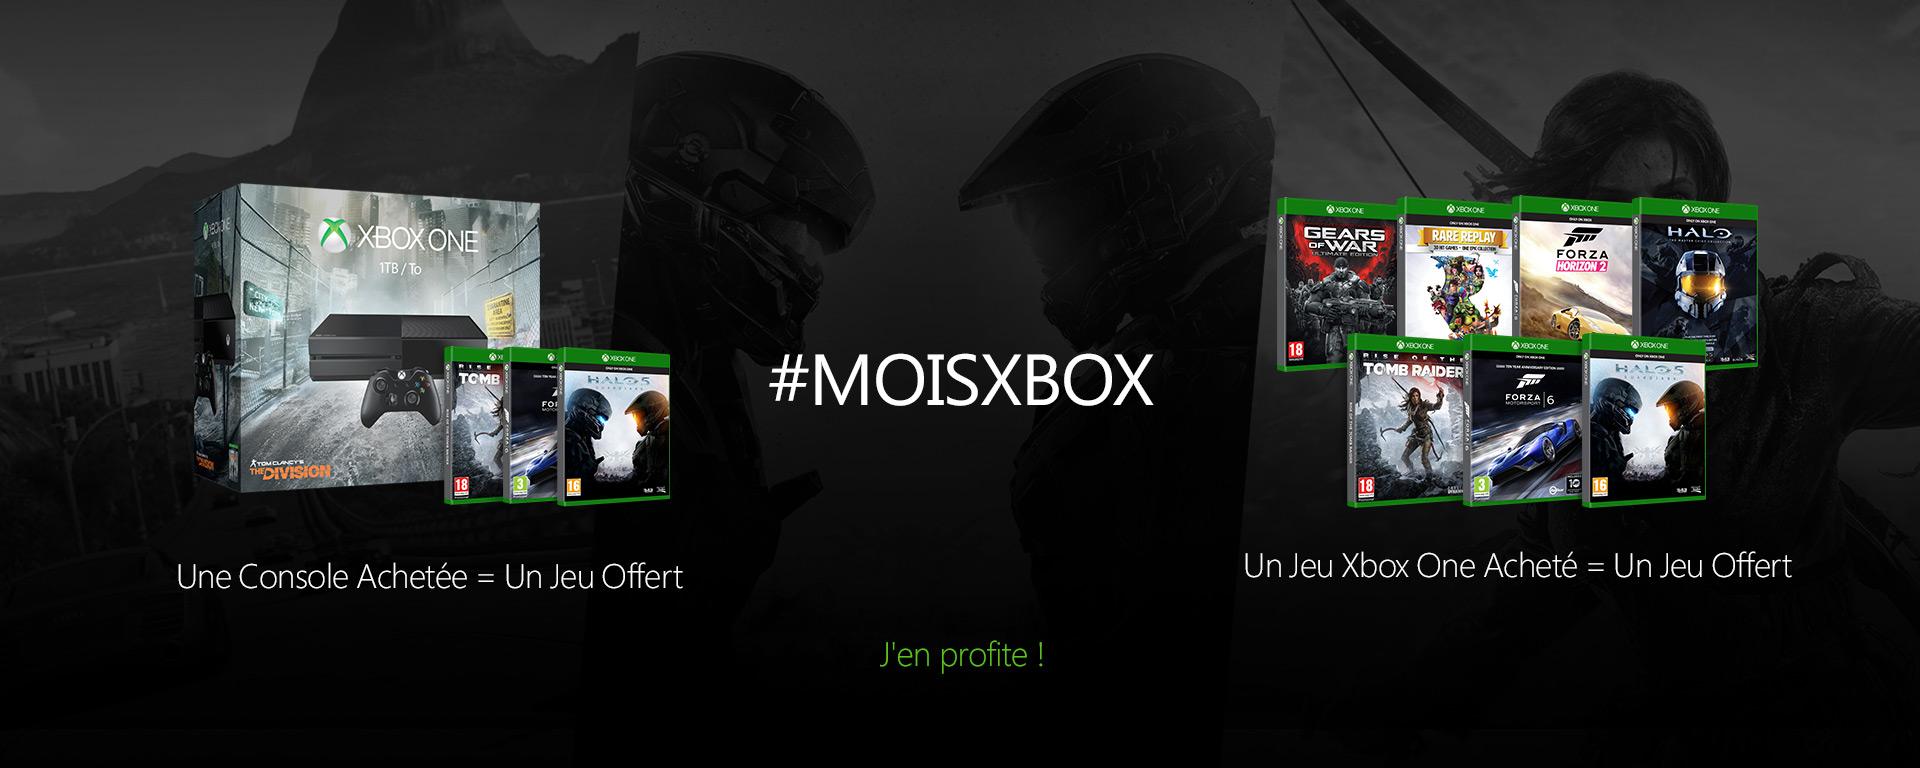 Site de rencontre xbox